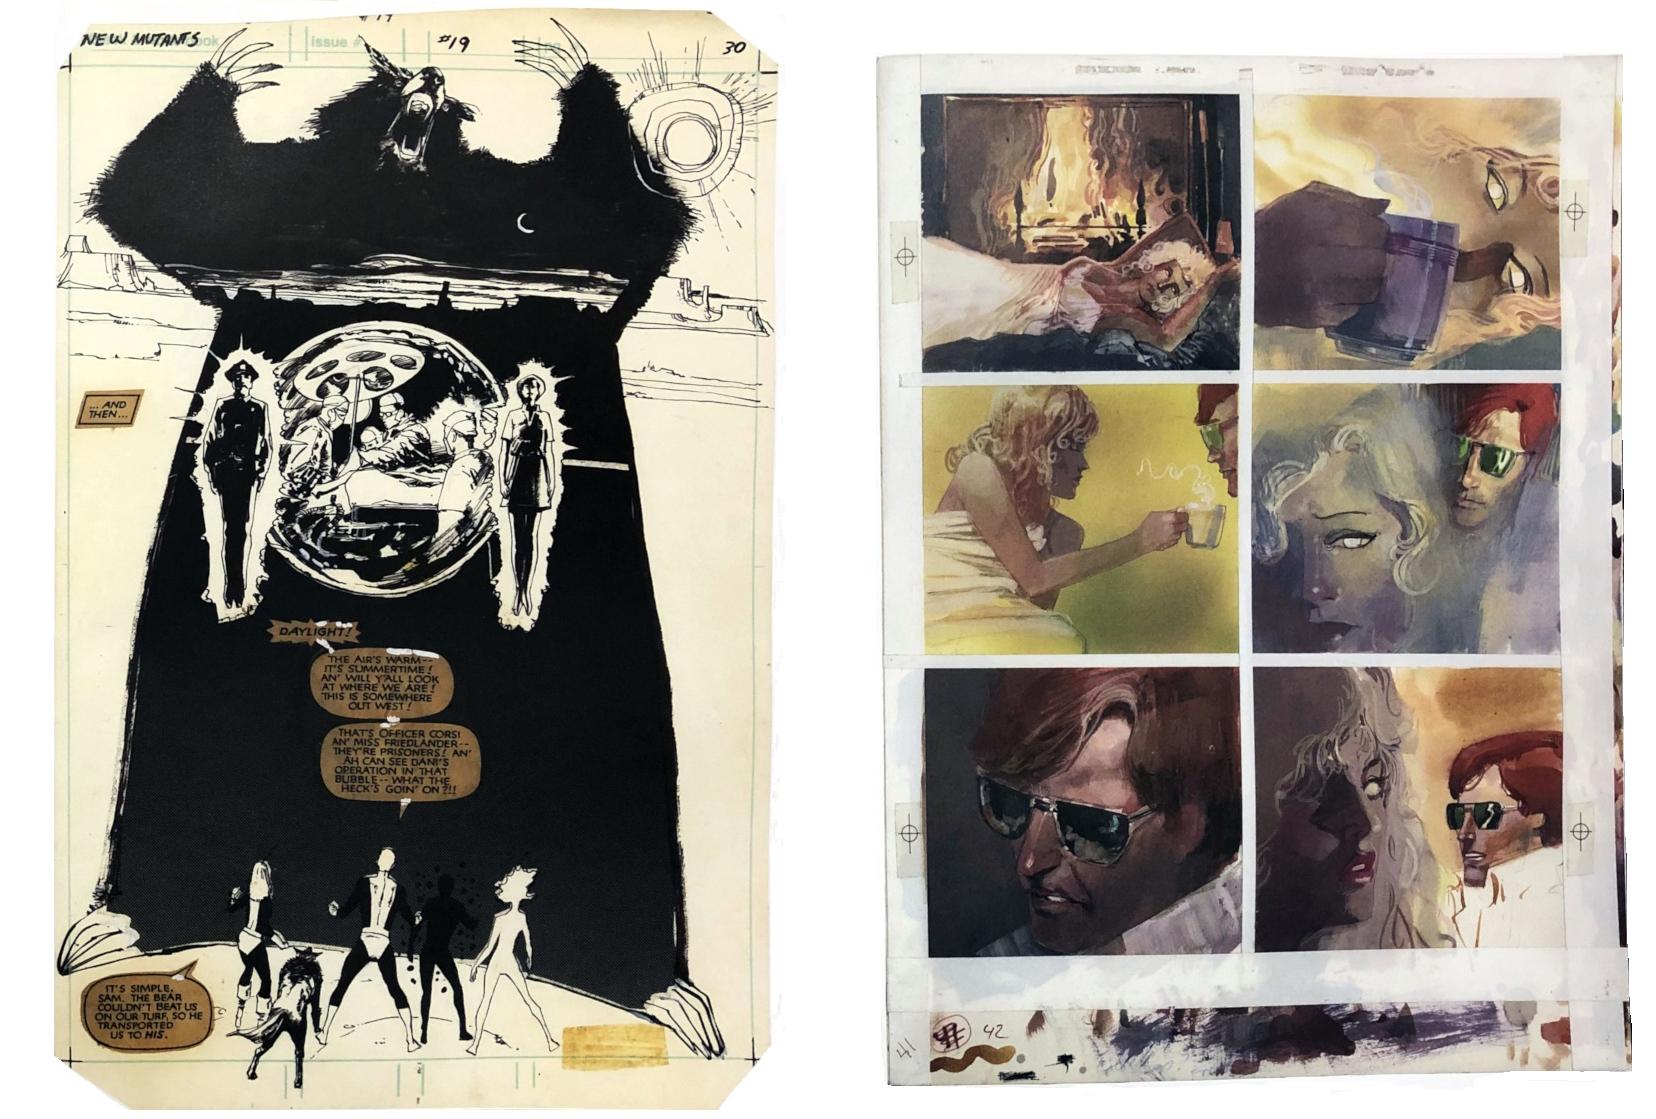 IDW Artifact Edition Hardcover NEW BILL SIENKIEWICZ MUTANTS AND MOON KNIGHT..